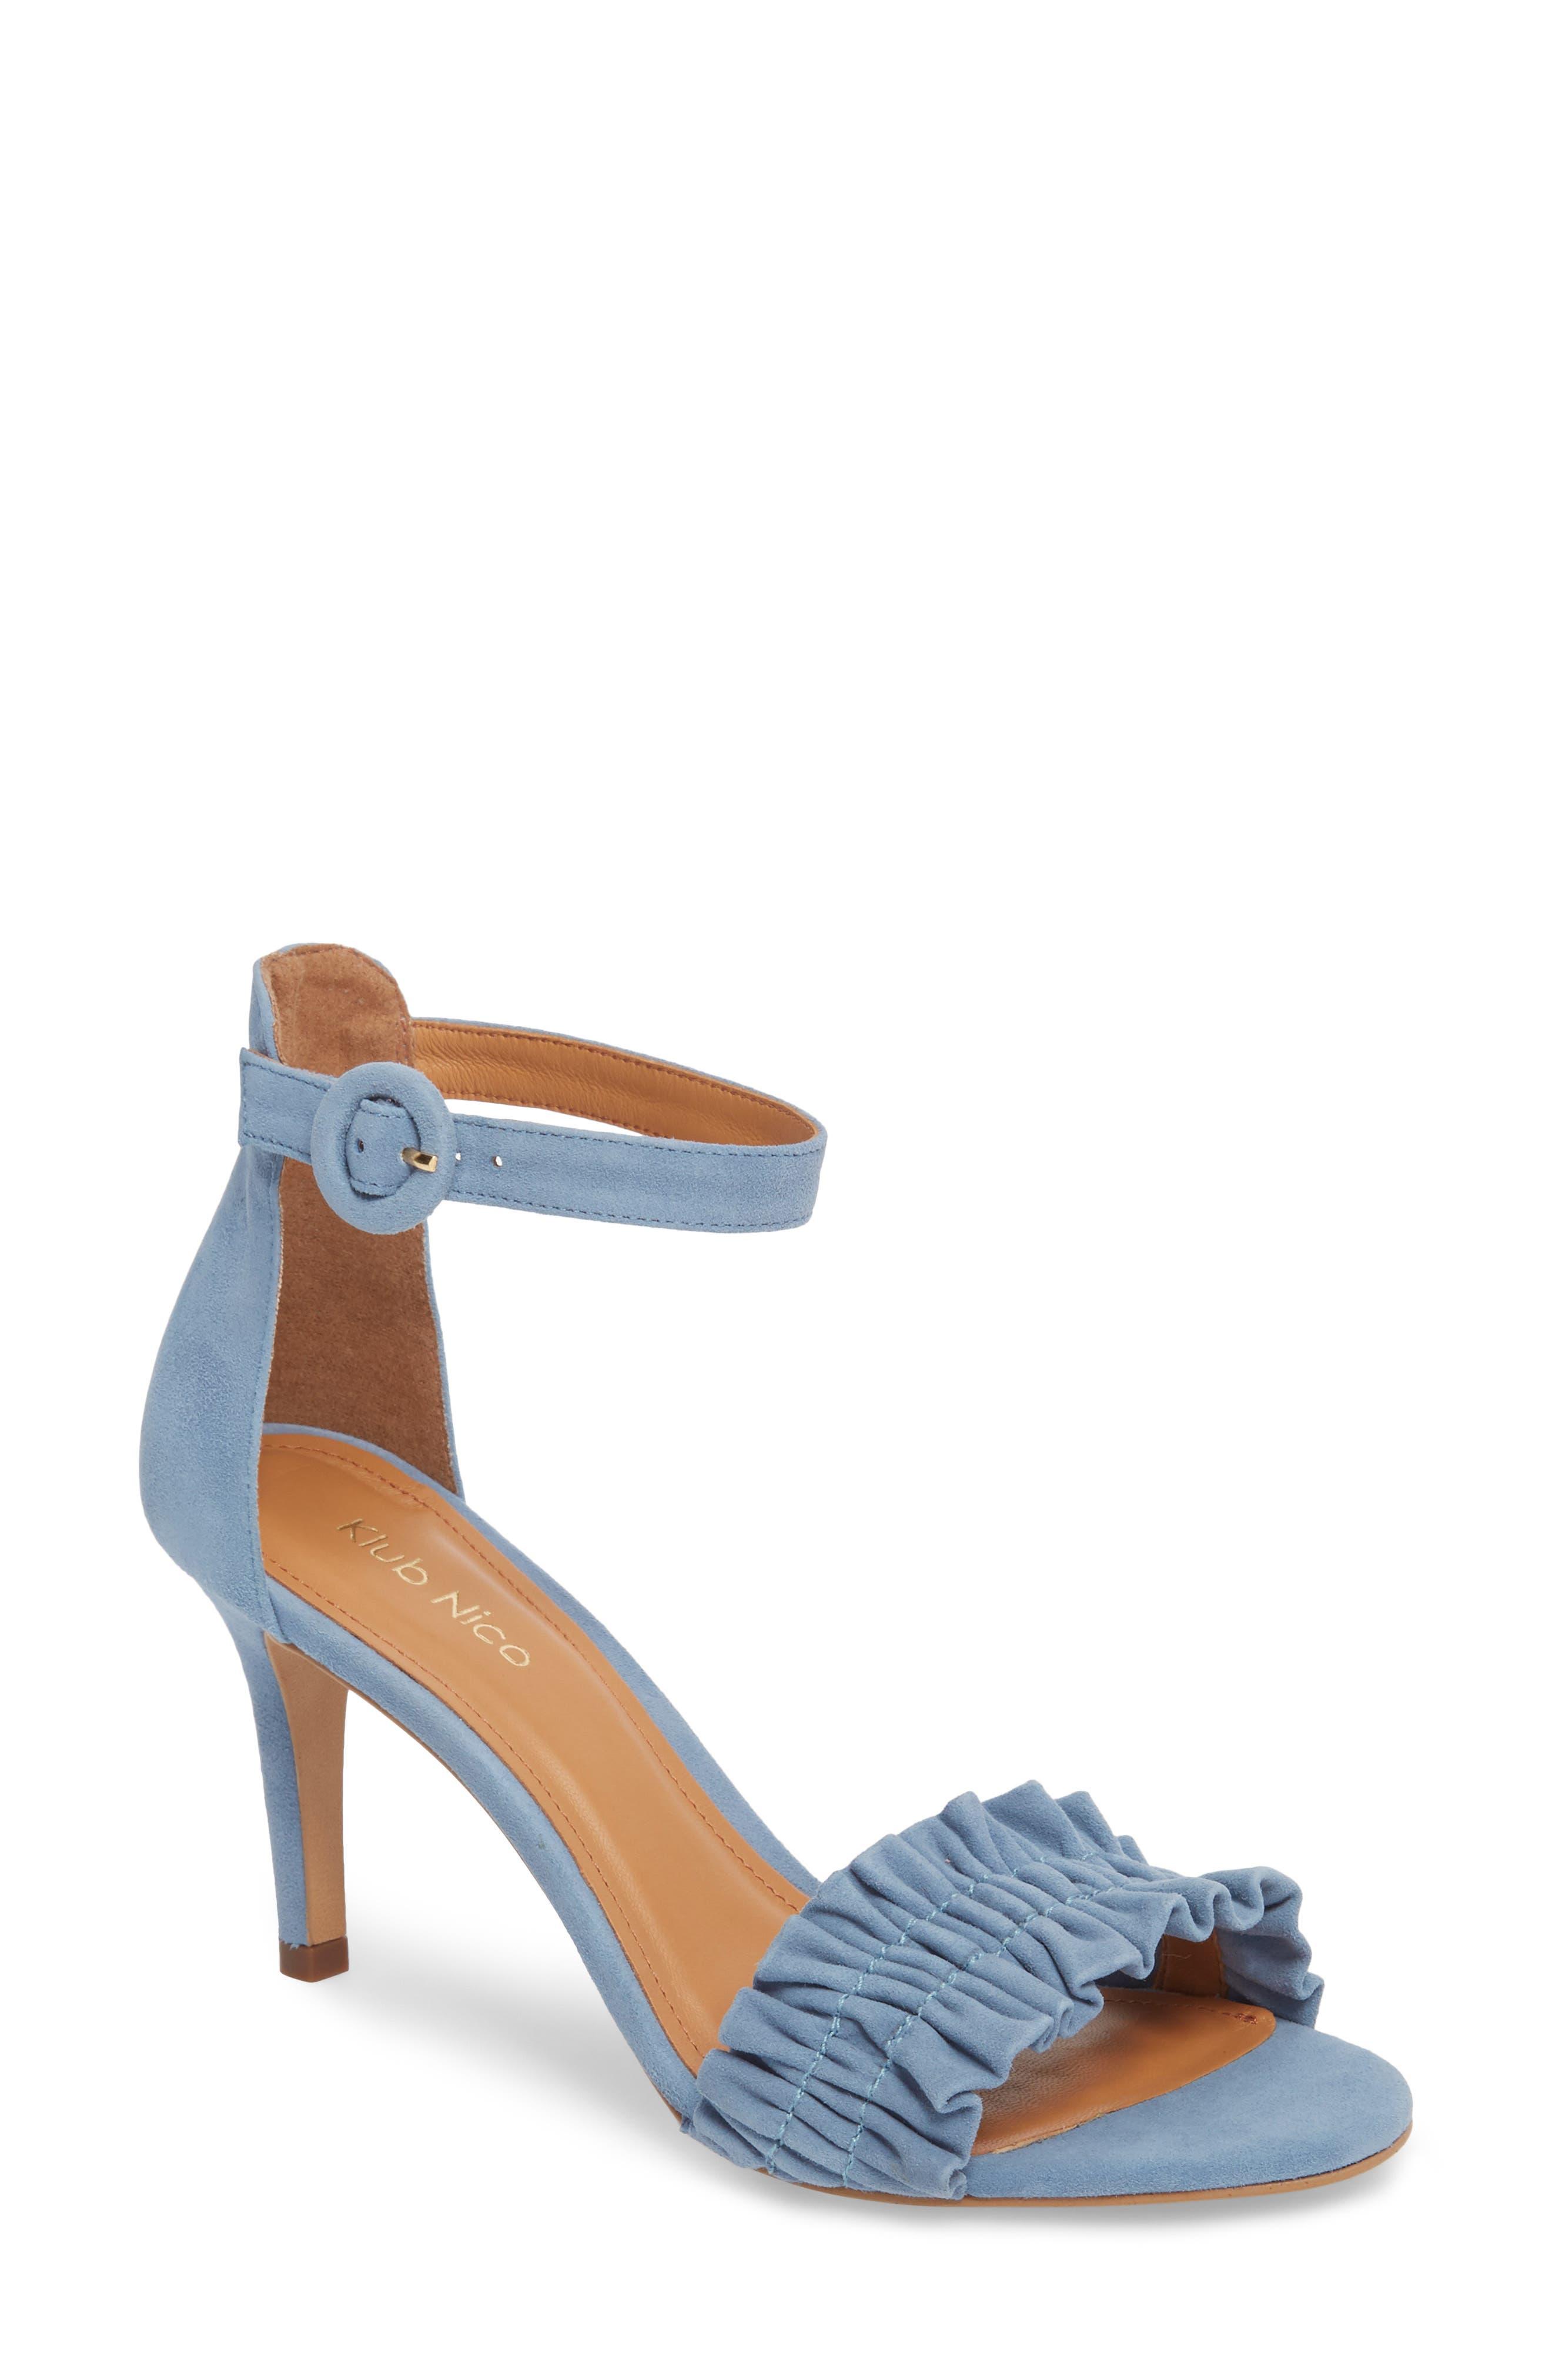 Arlow Sandal,                         Main,                         color, BLUE LEATHER